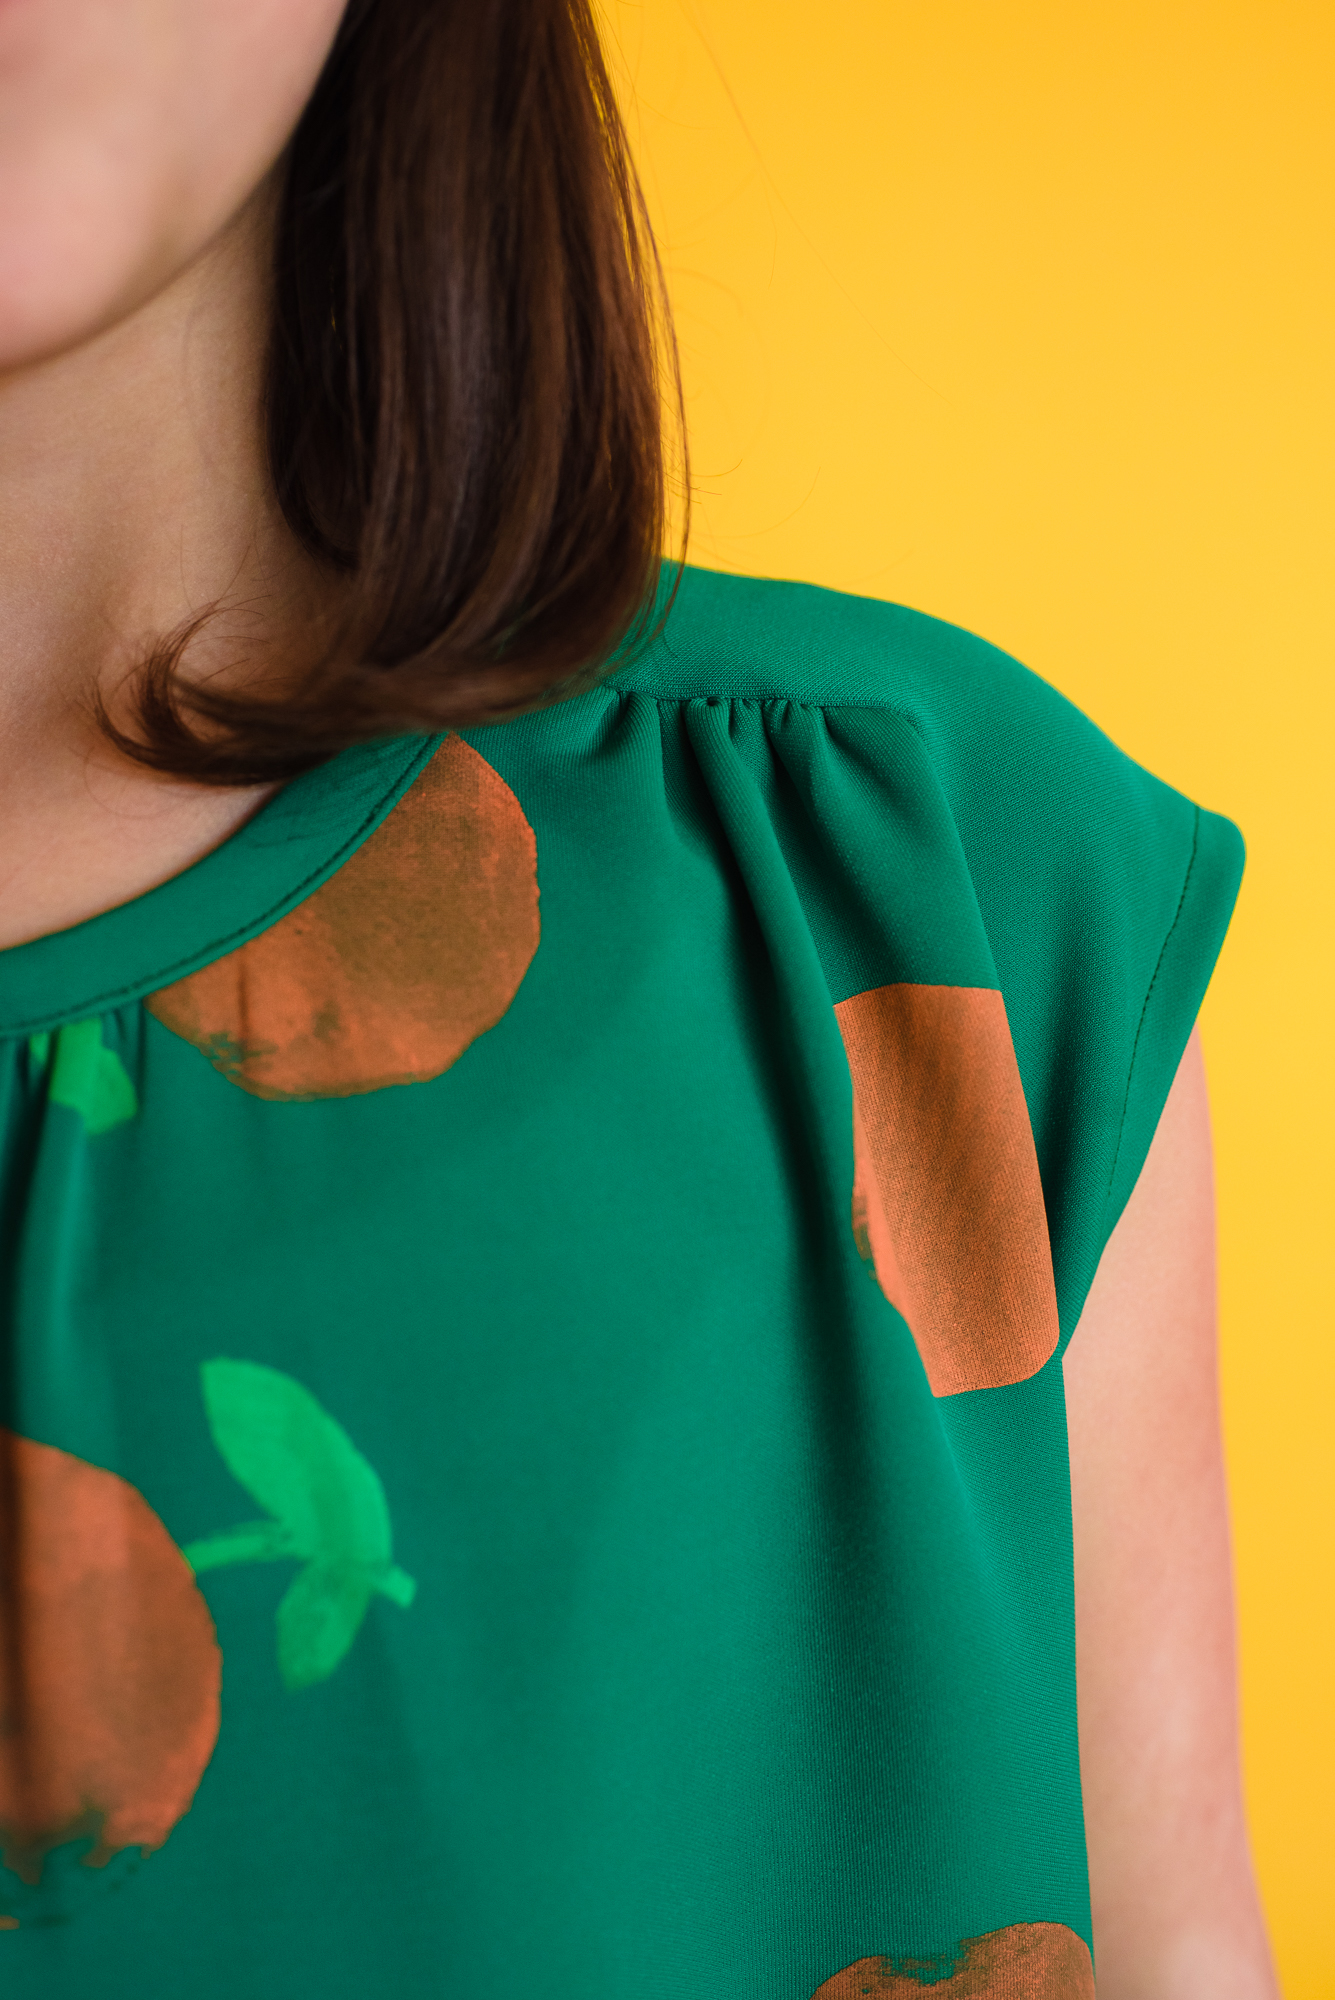 prp-kids-sewing-patterns06.jpg